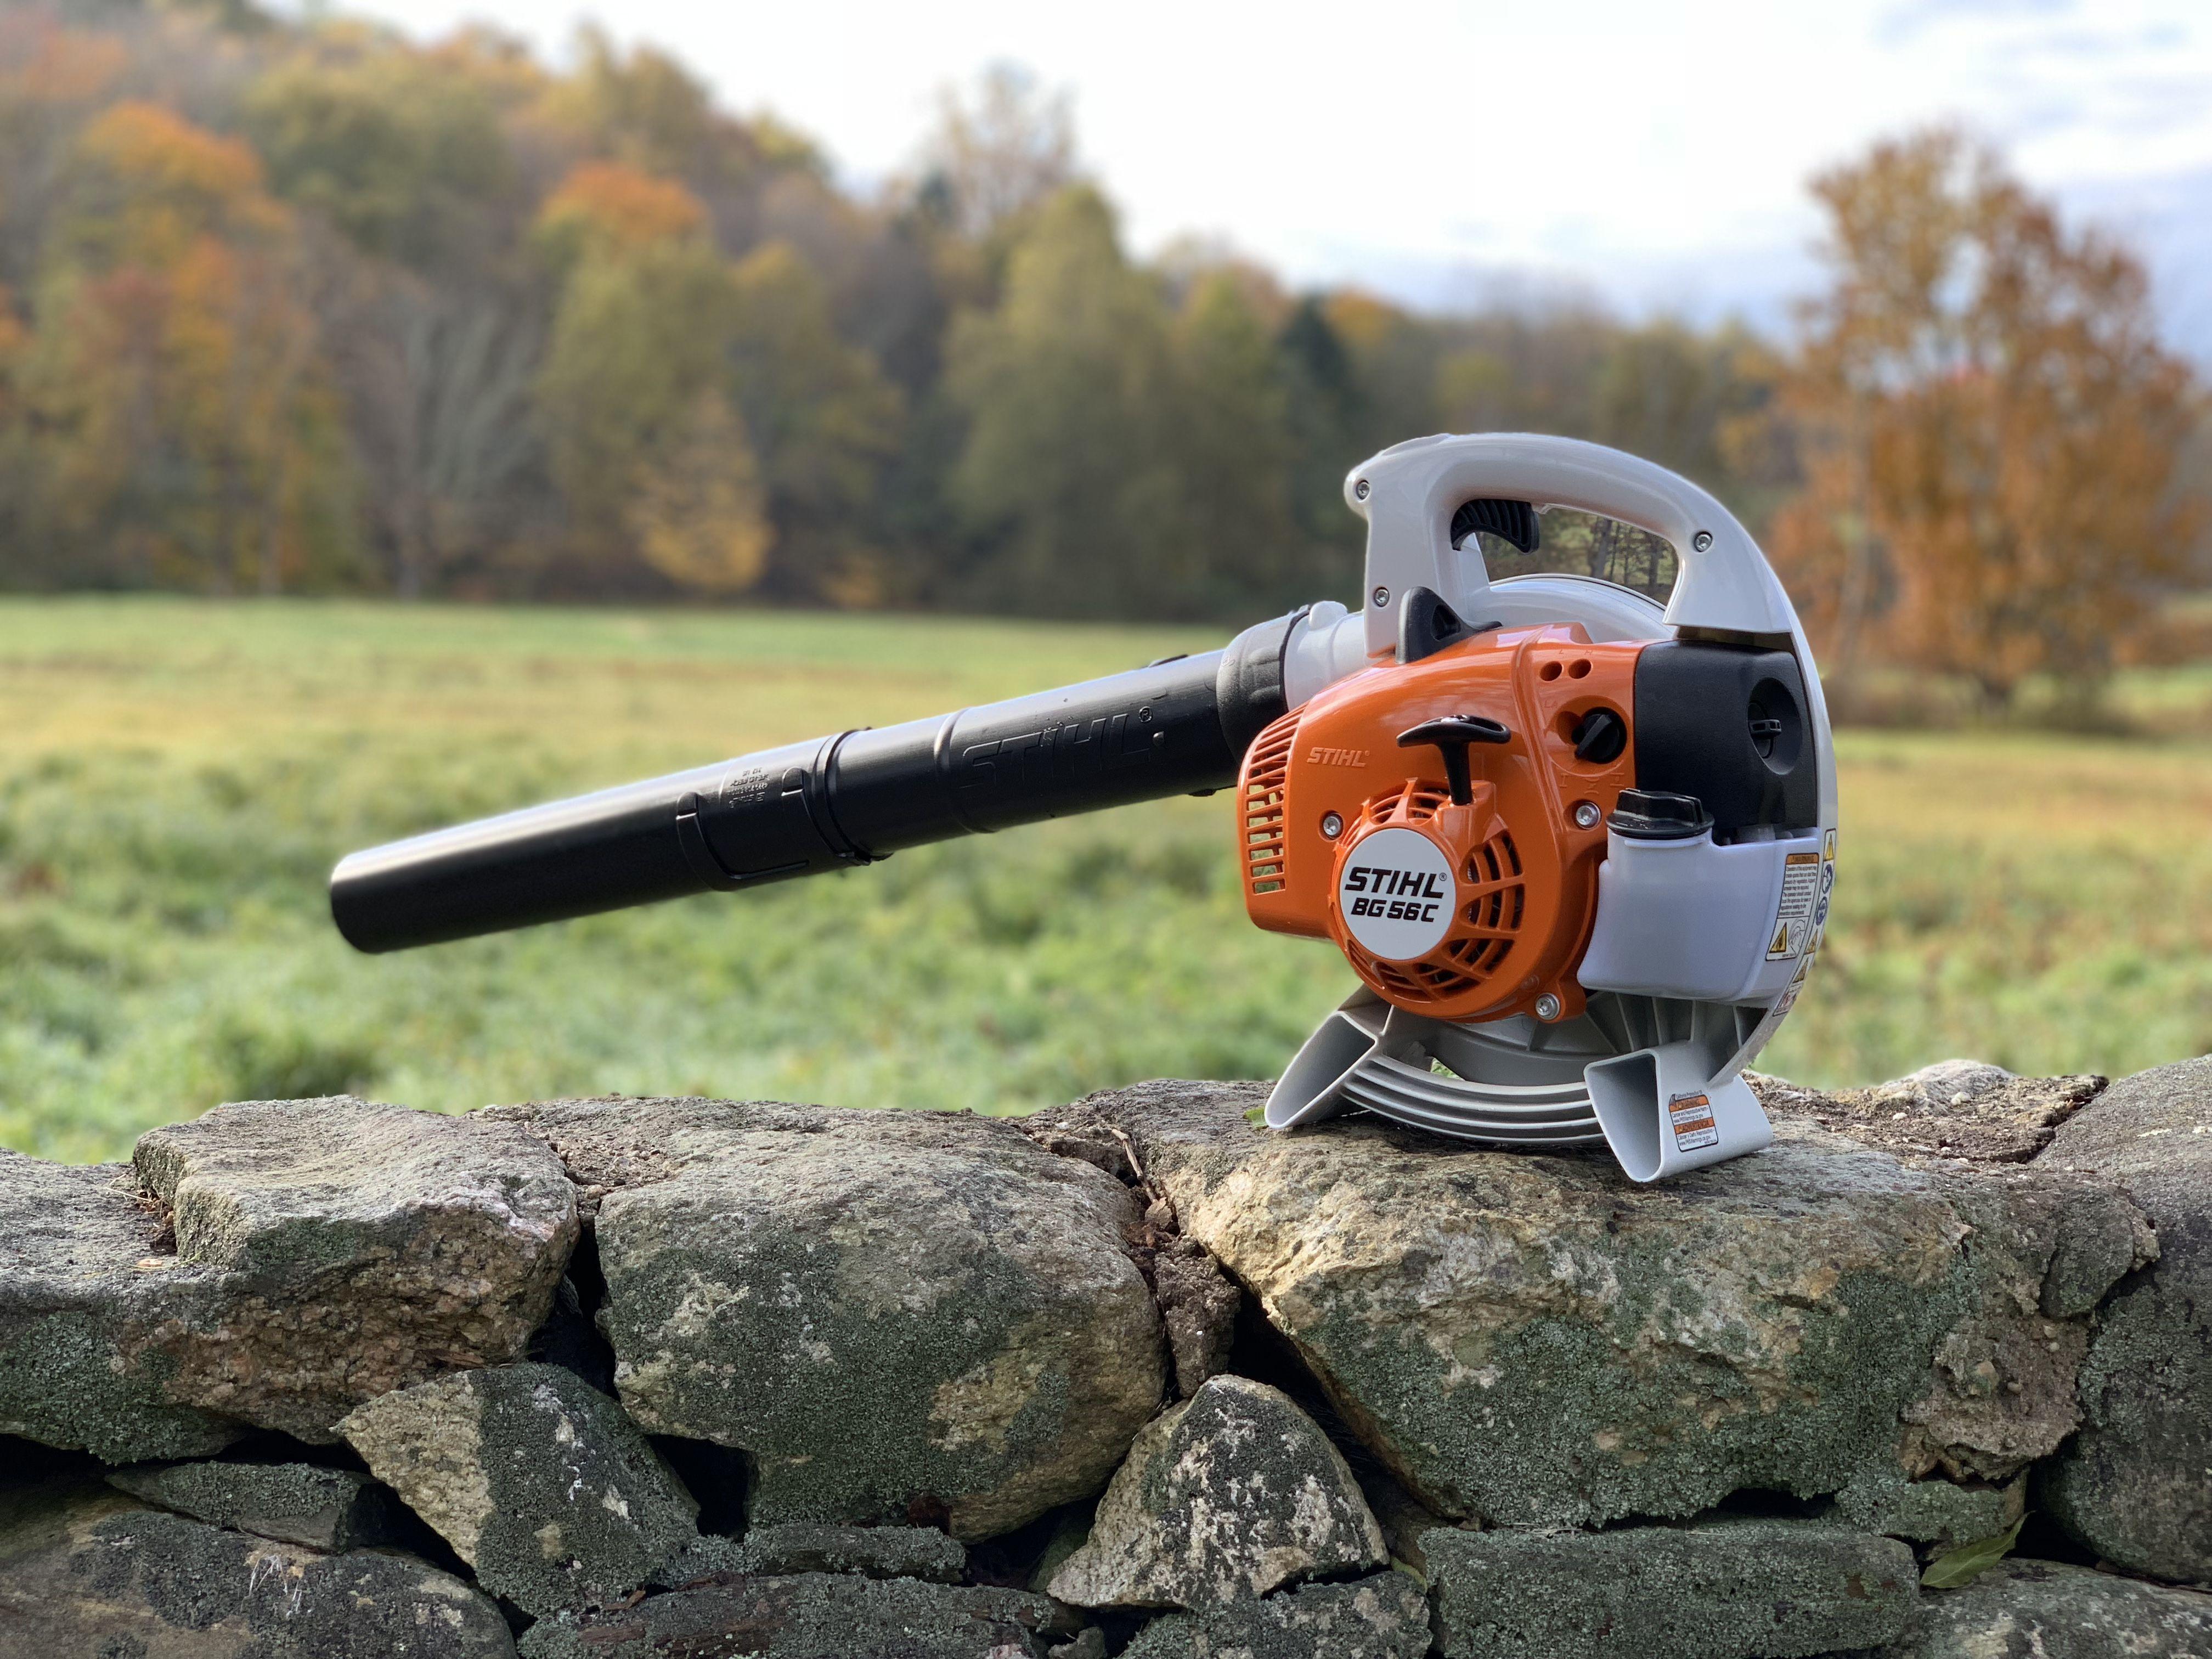 medium resolution of stihl bg 56 c e handheld blower